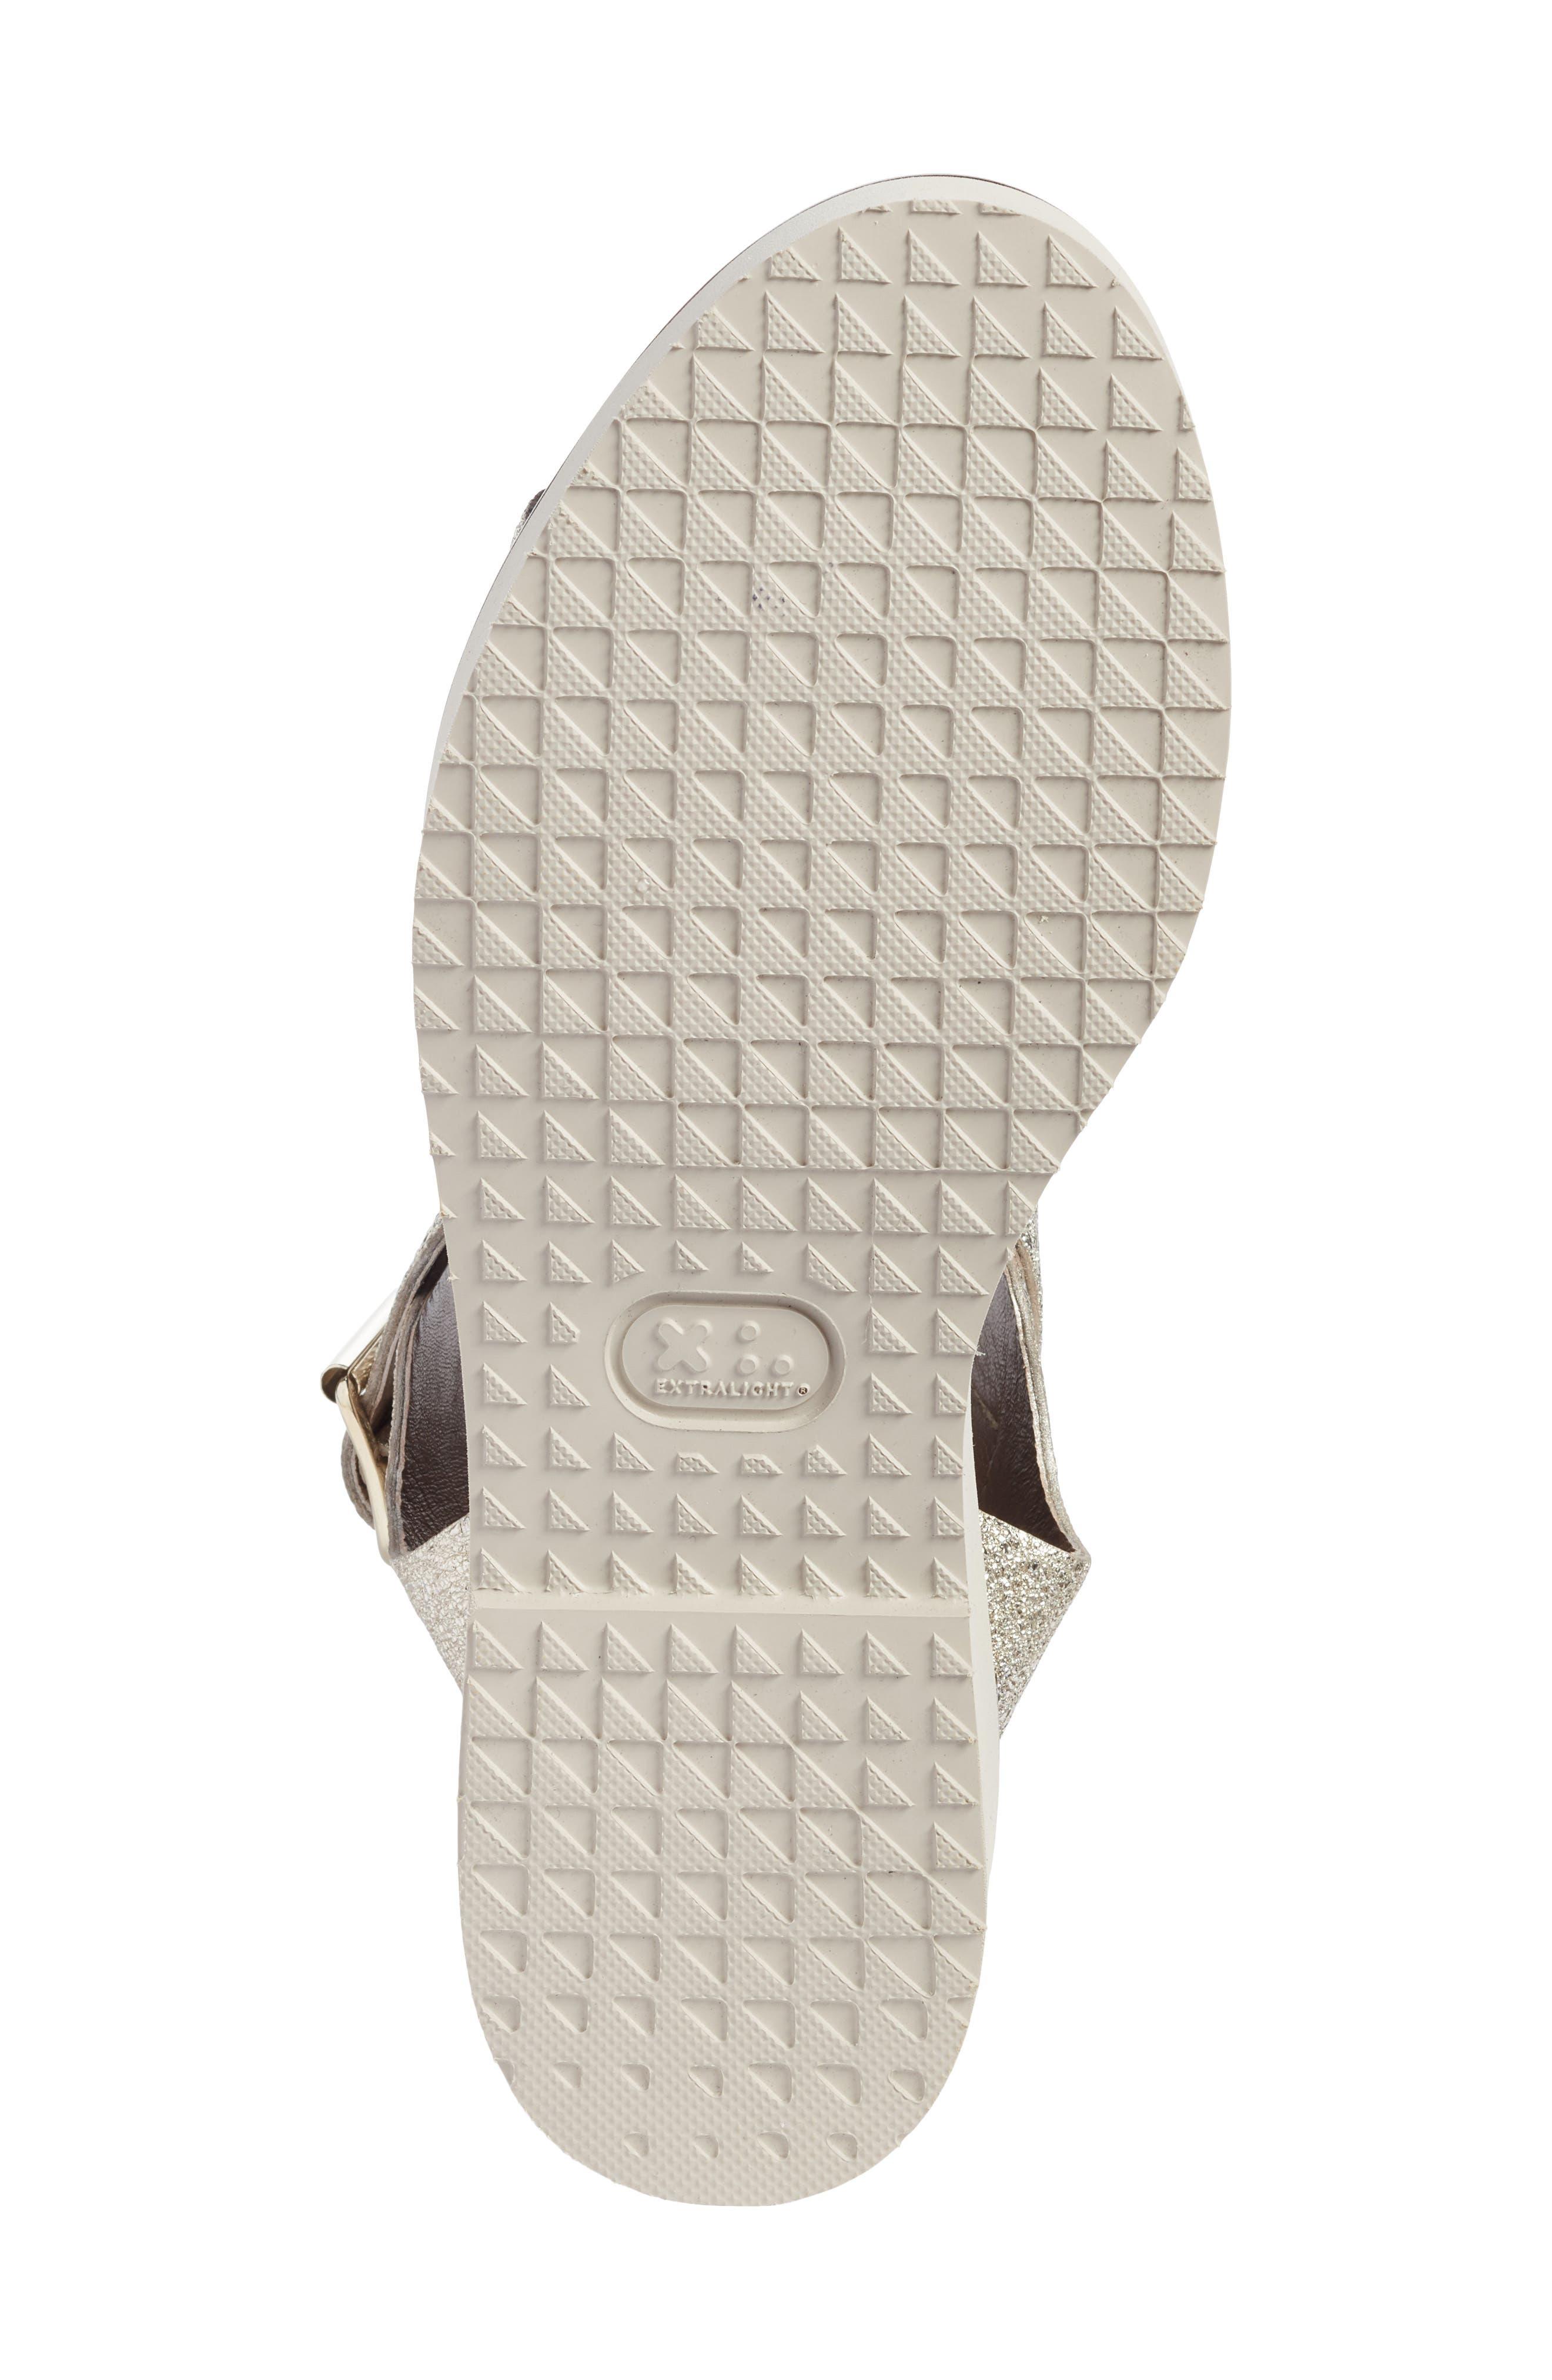 Ankle Strap Sandal,                             Alternate thumbnail 6, color,                             Golden Leather